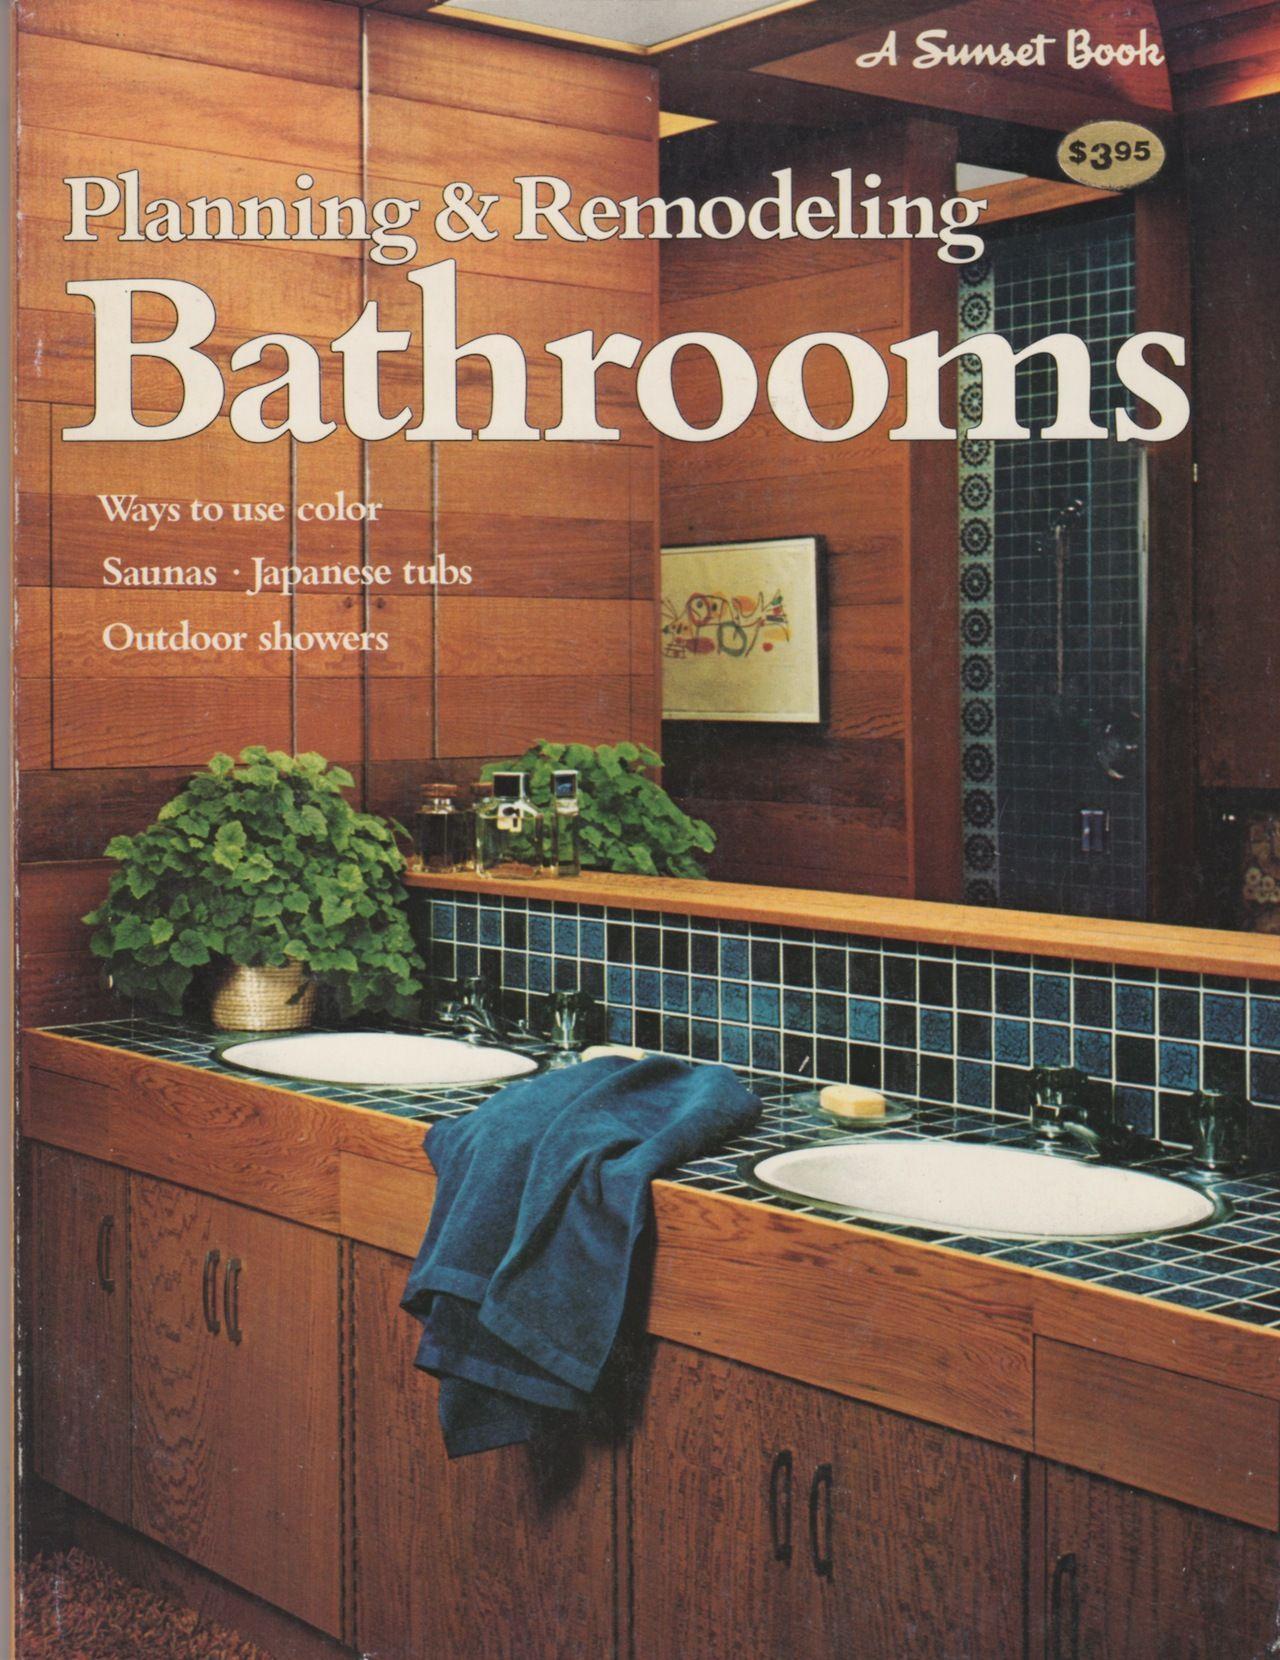 bathroom remodeling books. Simple Books Planning U0026 Remodeling Bathrooms A Sunset Book Lane 1975 For Bathroom Books M